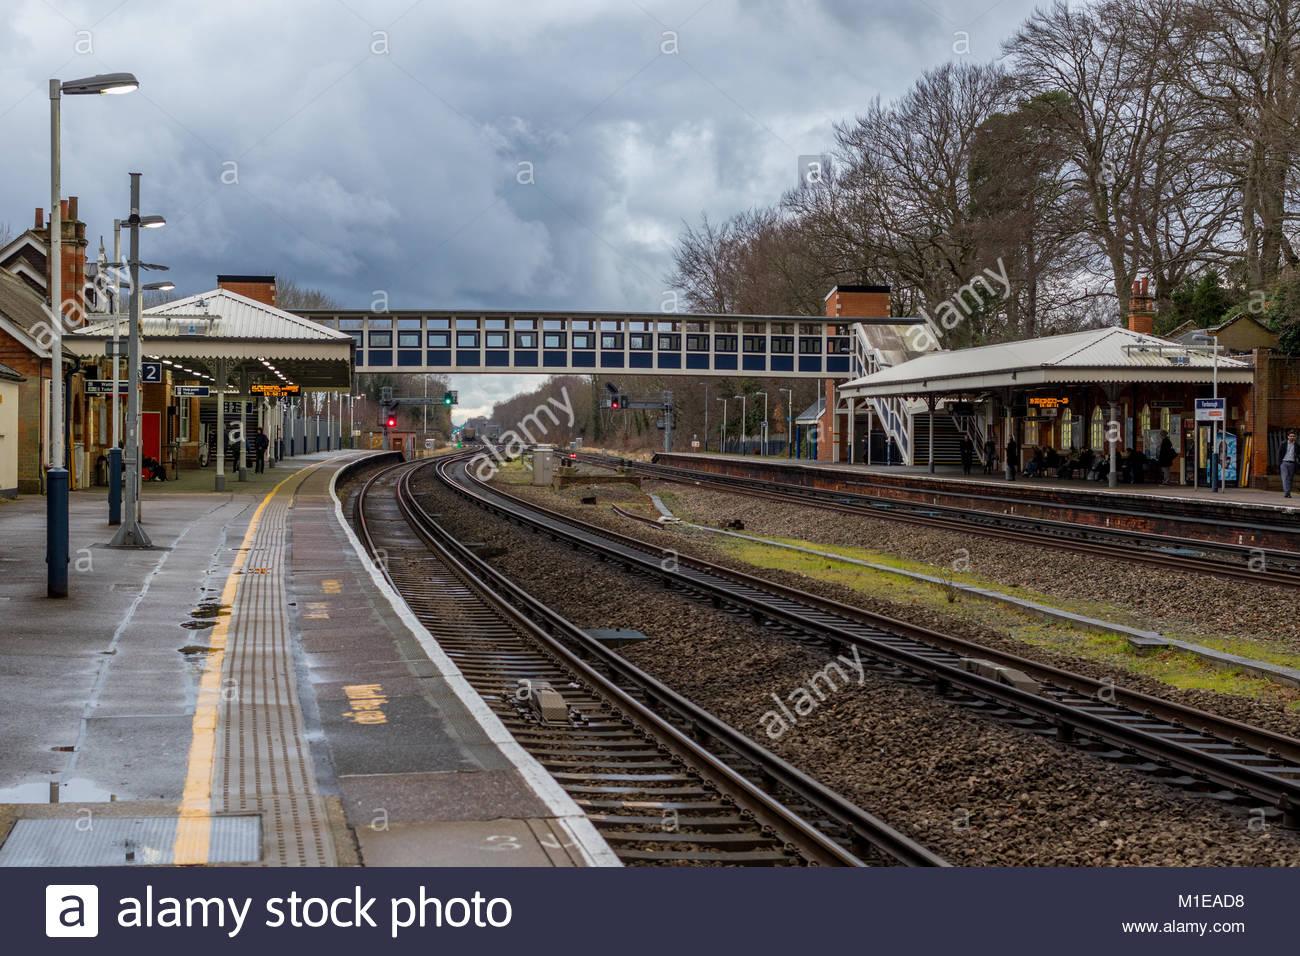 Storm Clouds over Farnborough Main Railway Station, Hampshire, UK - Stock Image